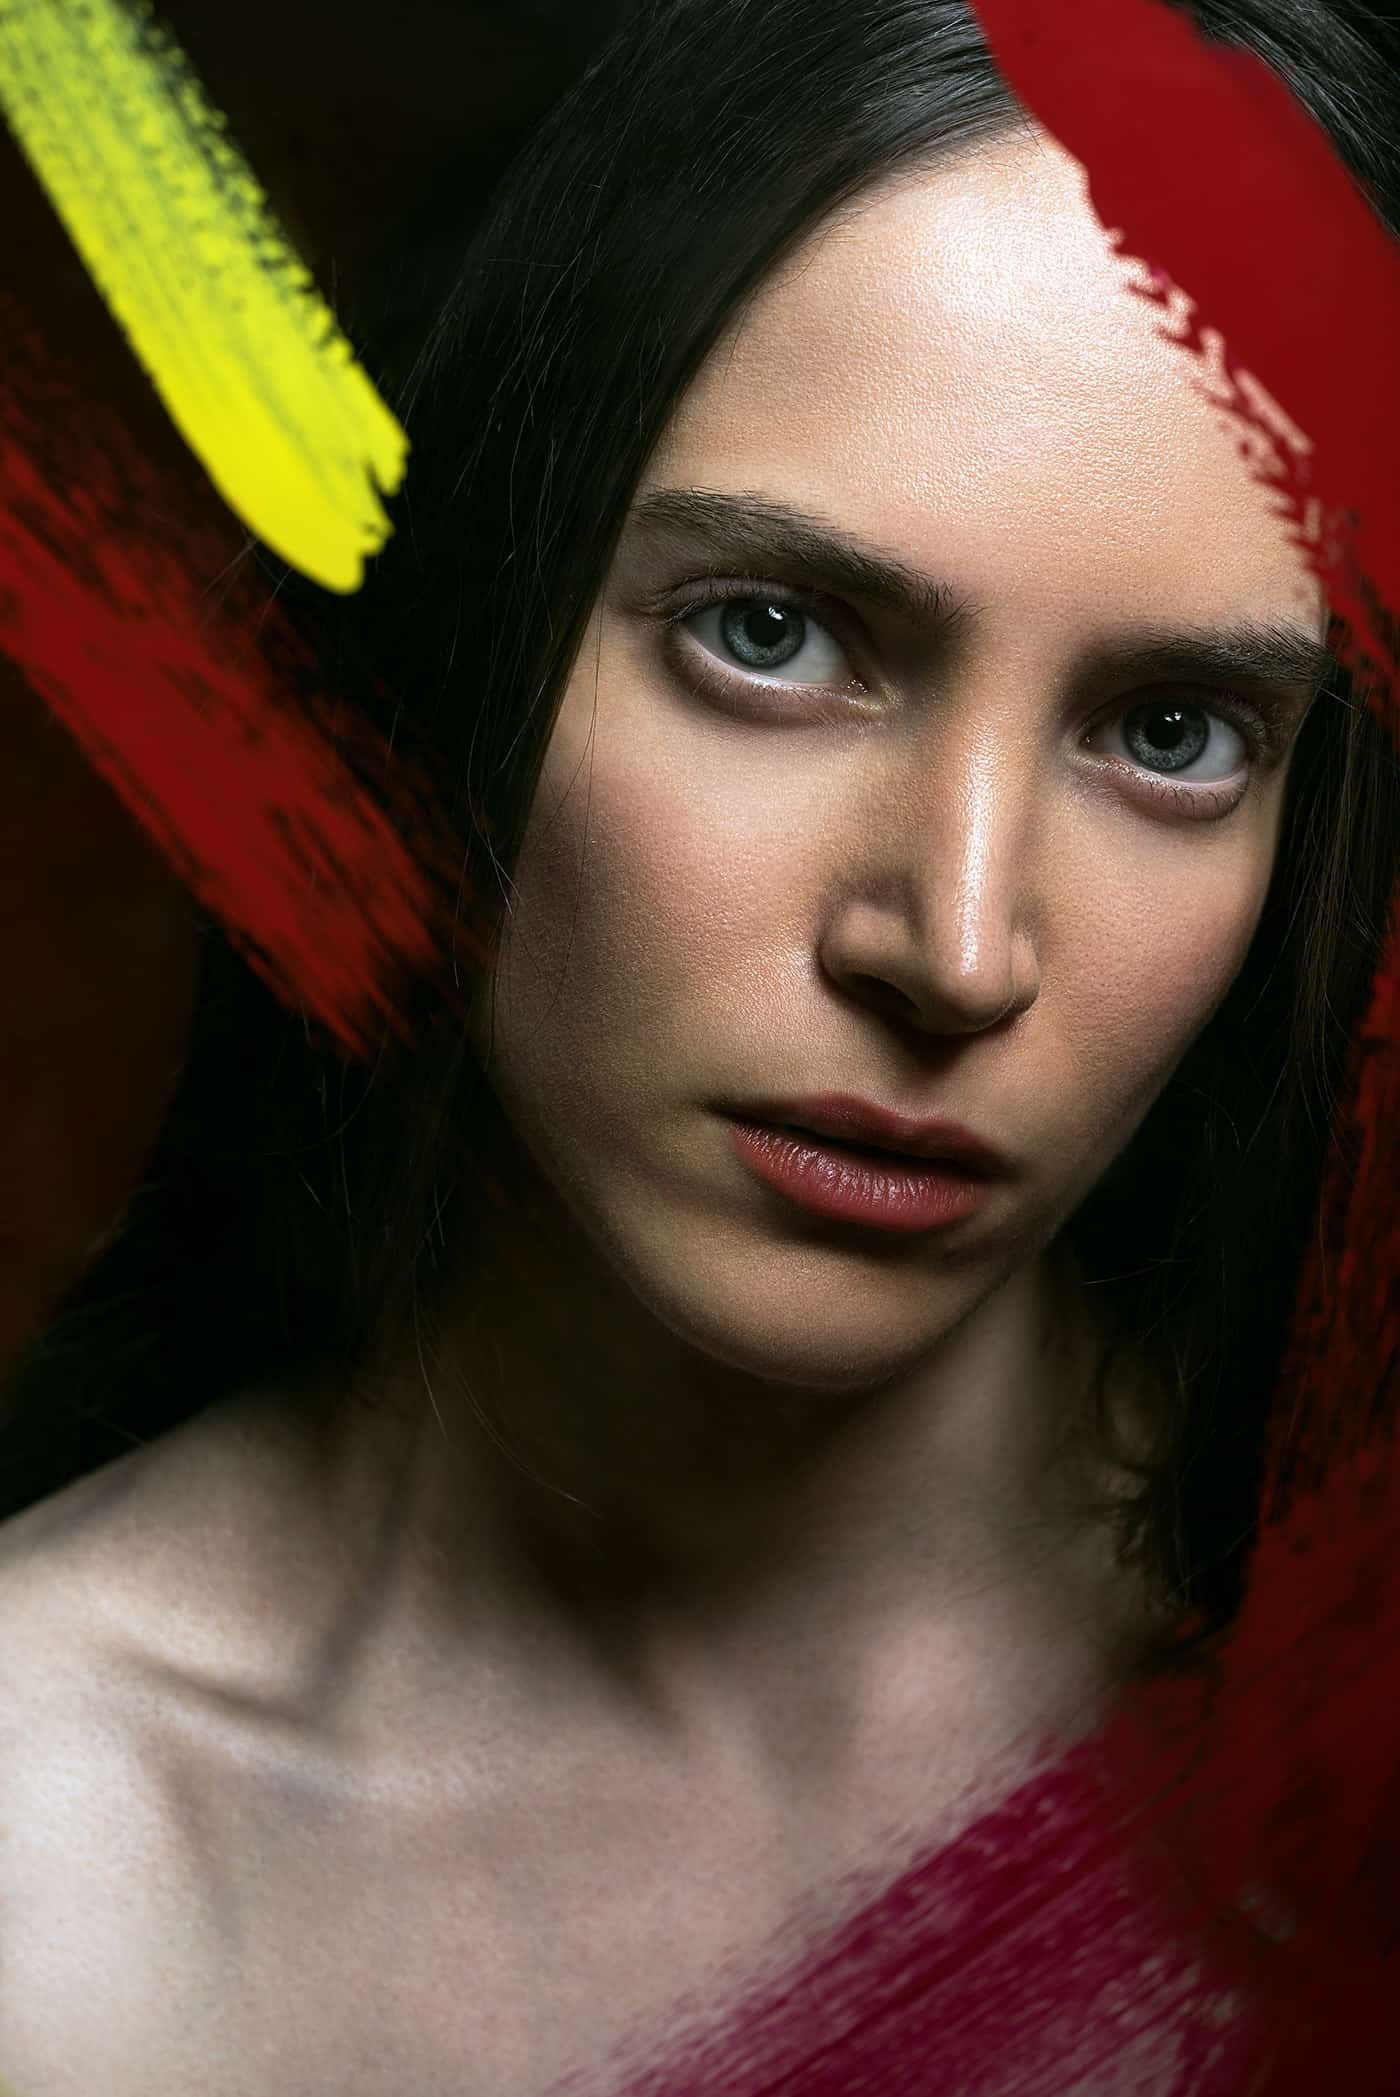 Kill Bill Inspired Photography | Peyman Naderi 001